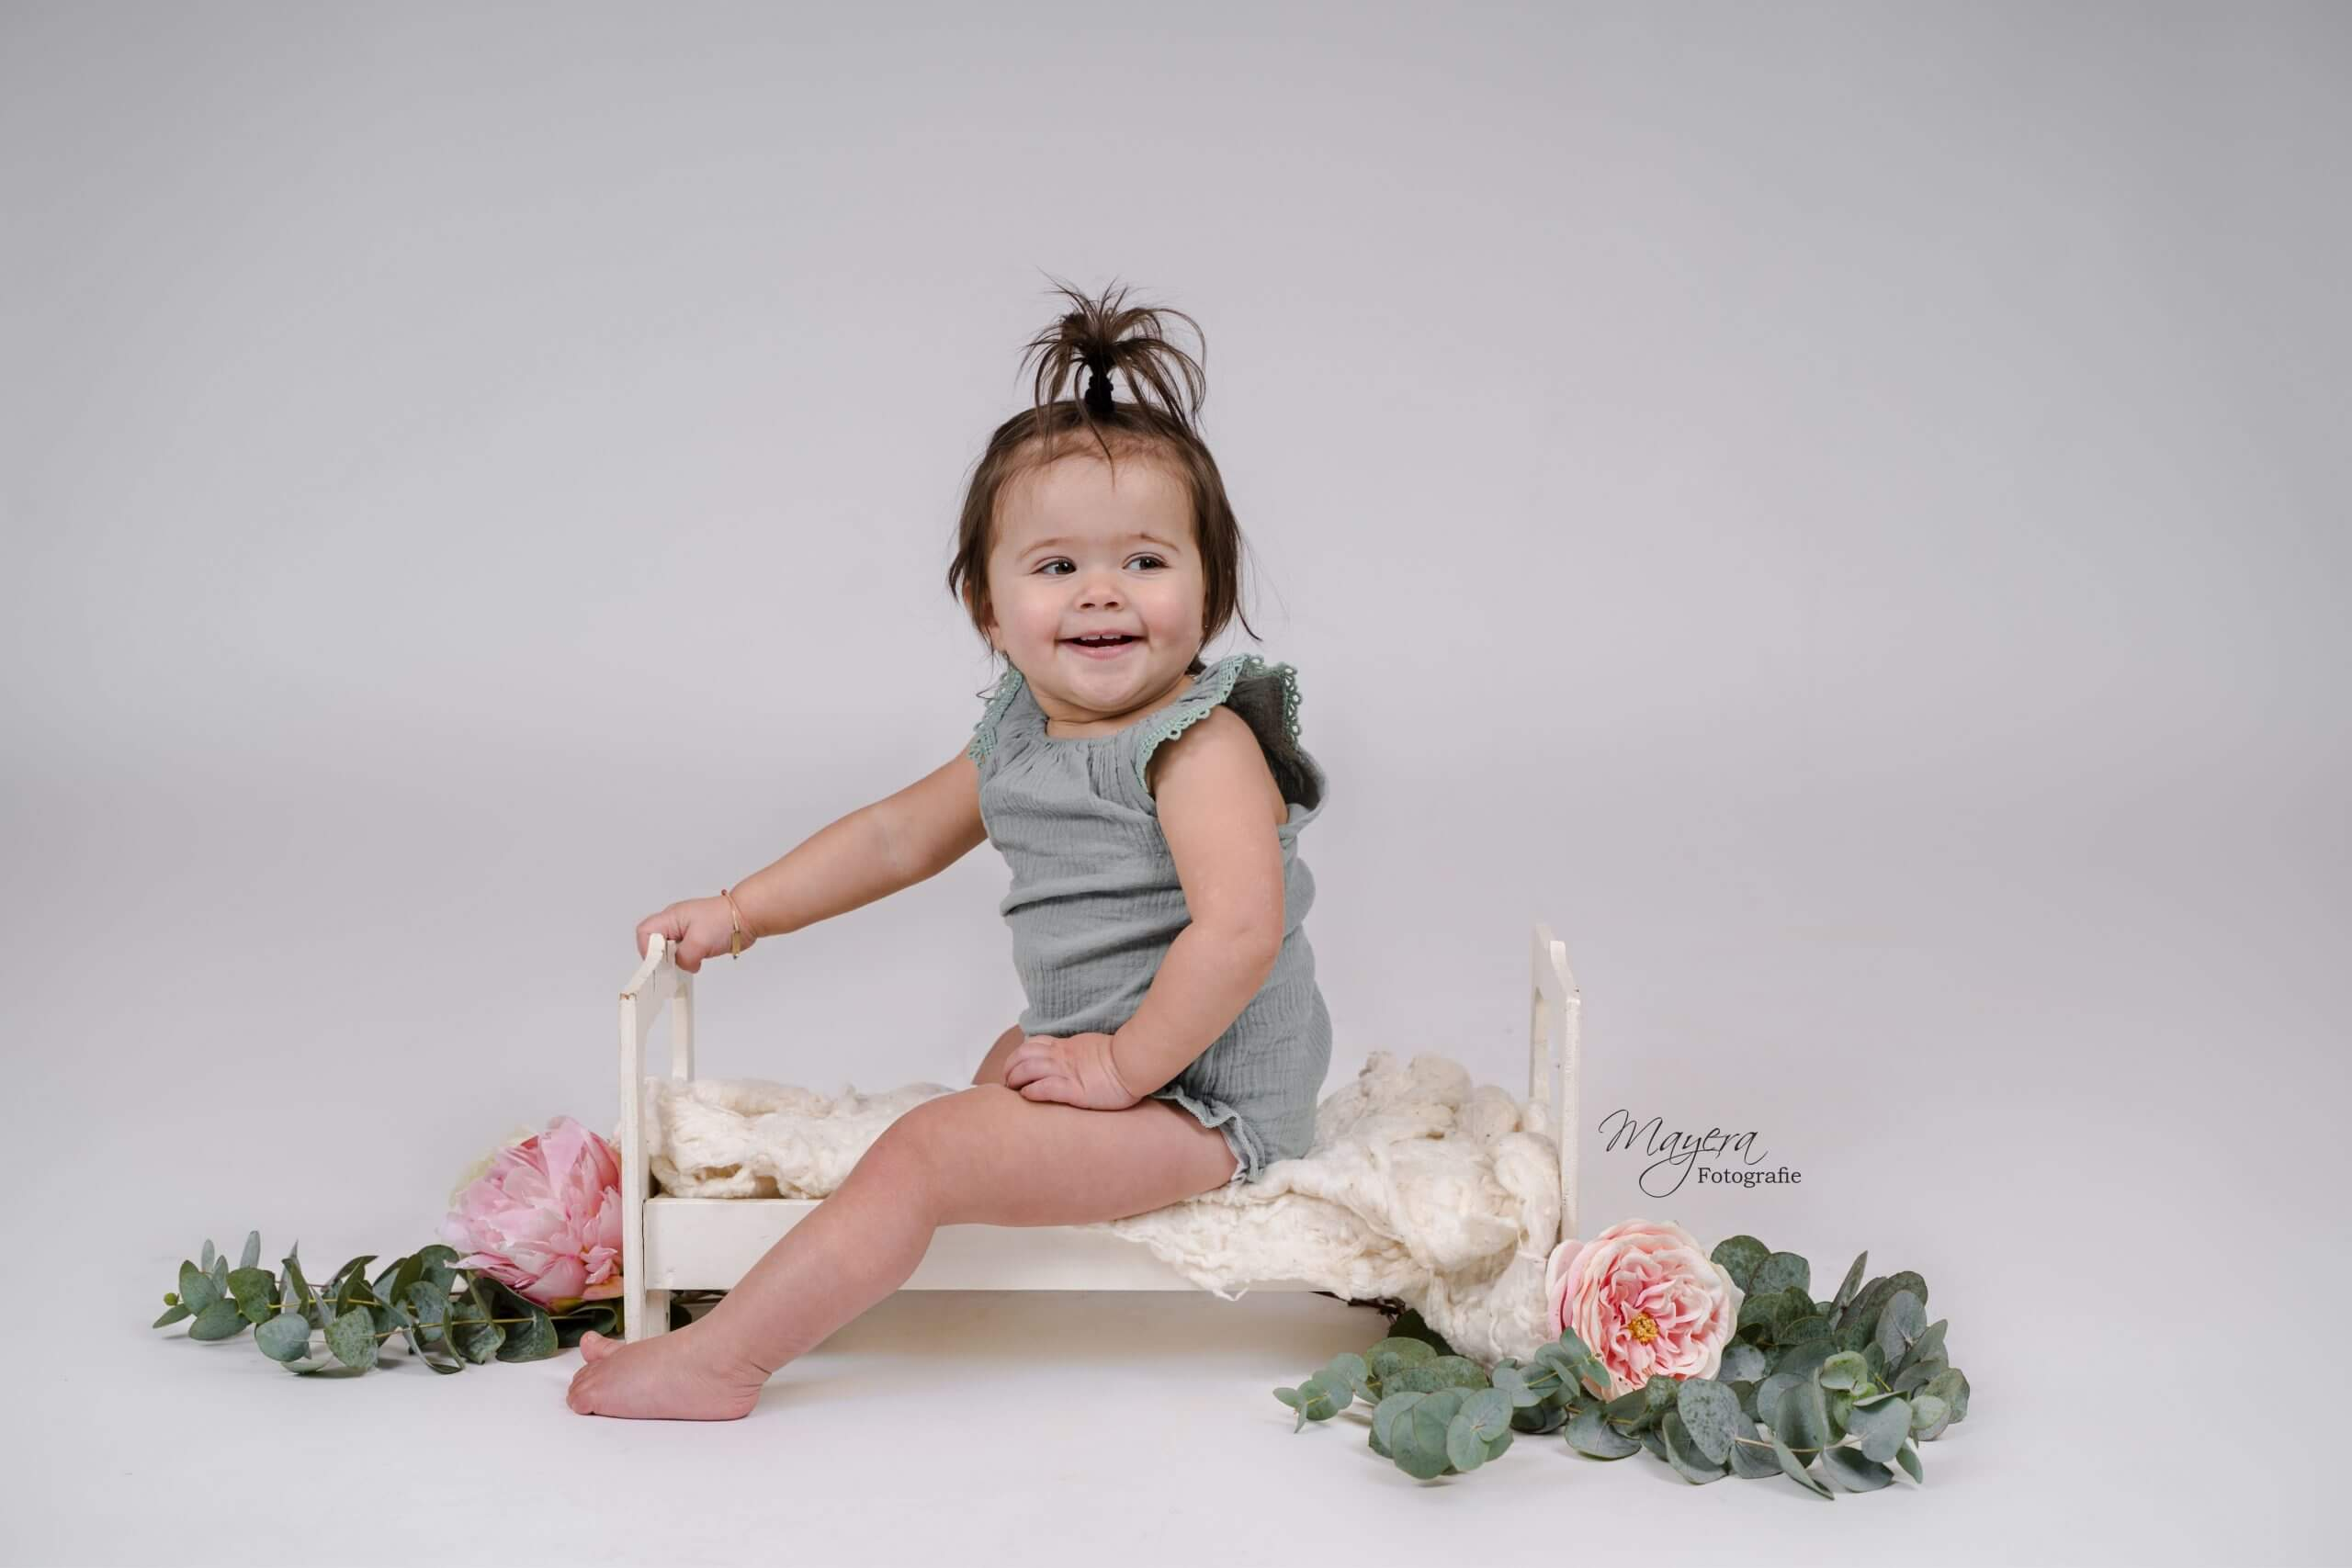 Sitter-baby-fotoshoot-utrecht-1-1-scaled